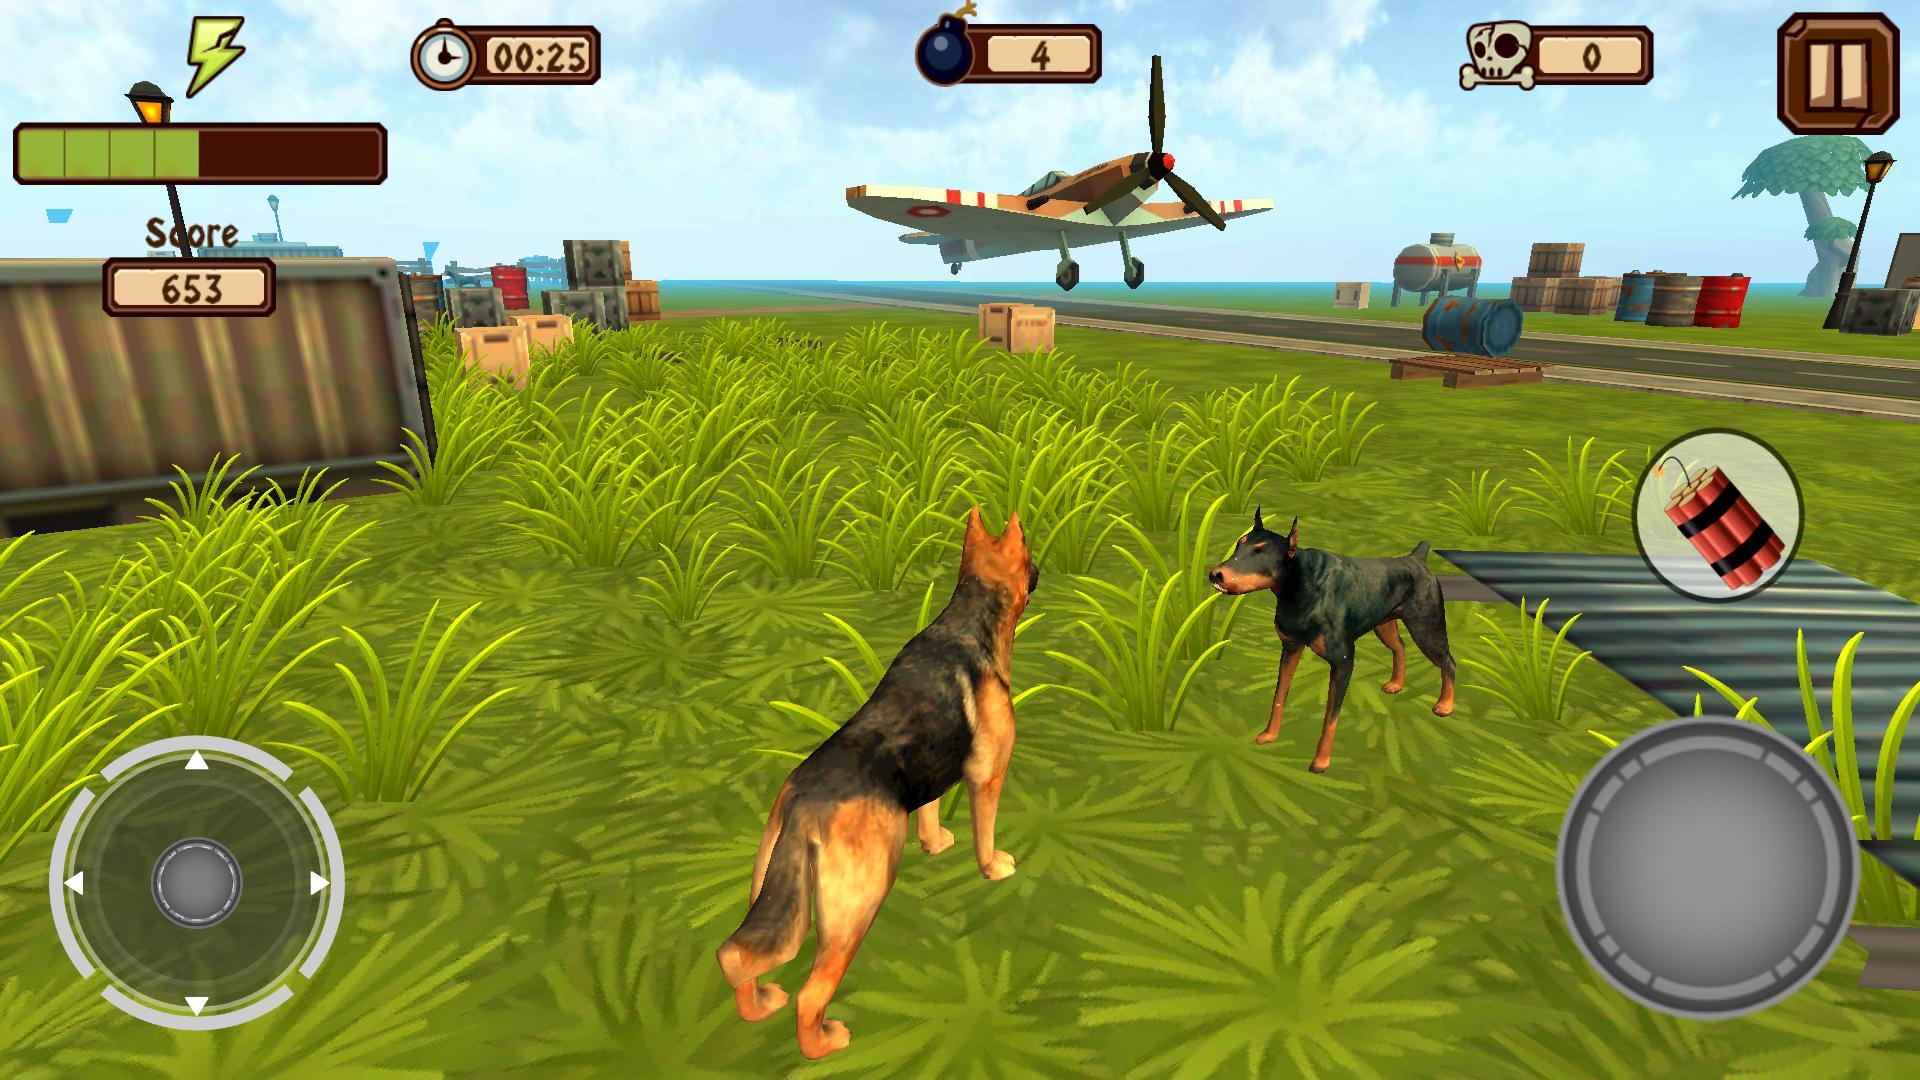 Doggy Dog Universe 游戏截图4